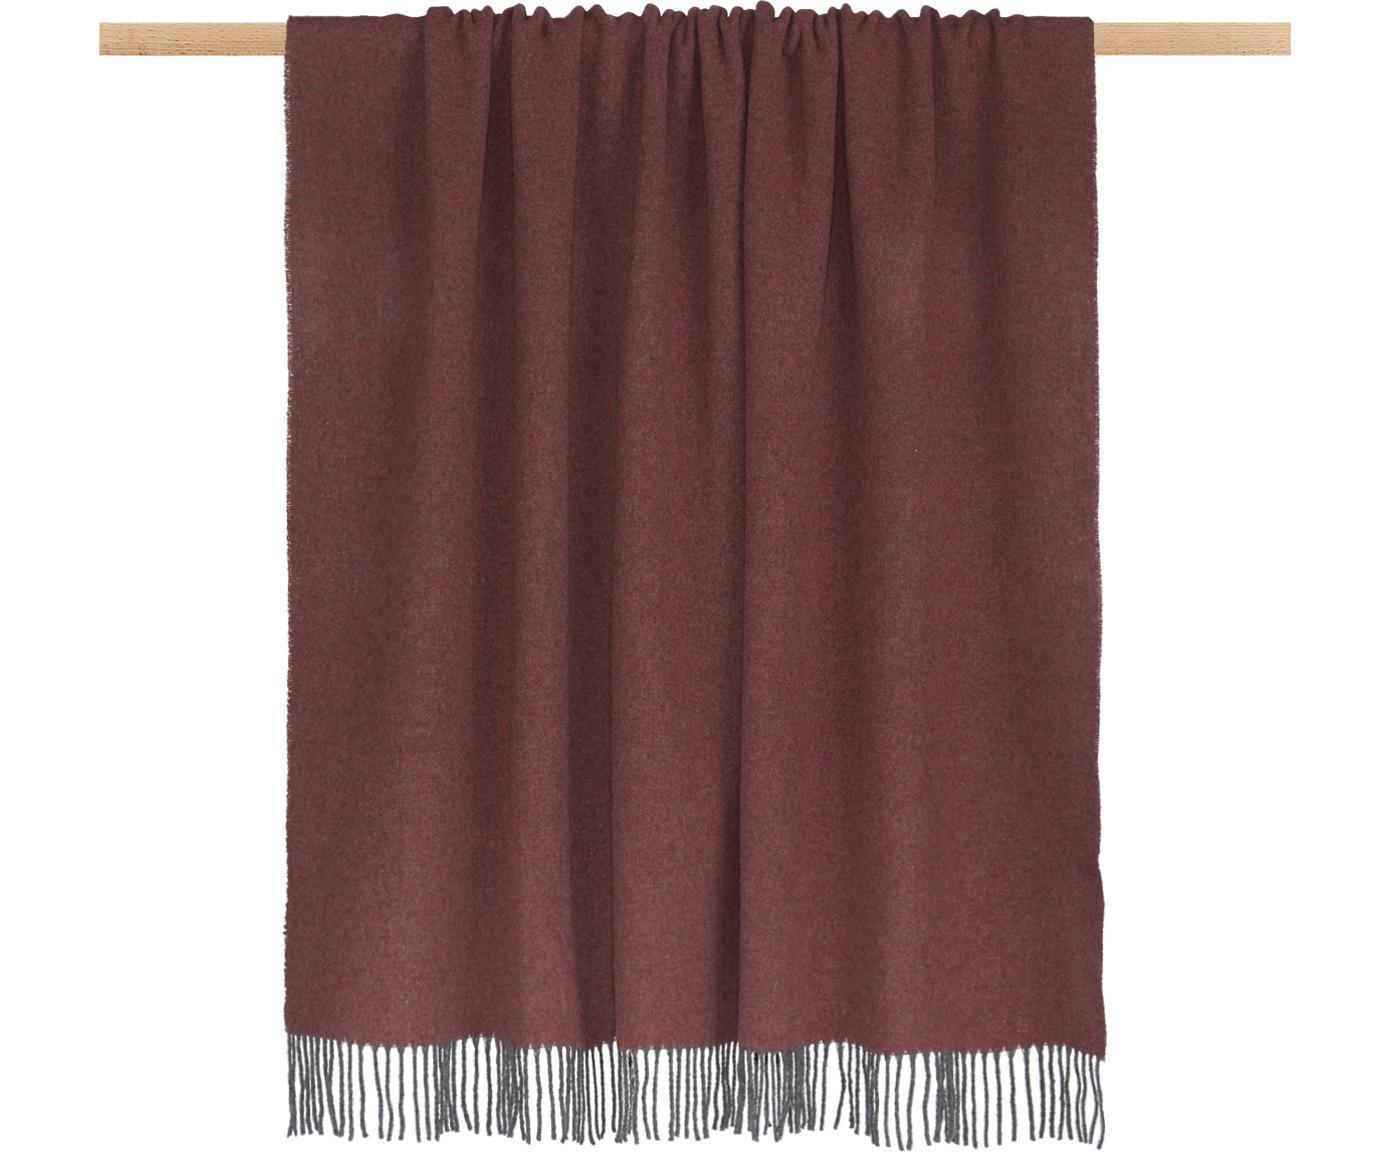 Manta de cachemira Liliana, 80%lana, 20%cachemir, Rojo, gris, An 130 x L 170 cm